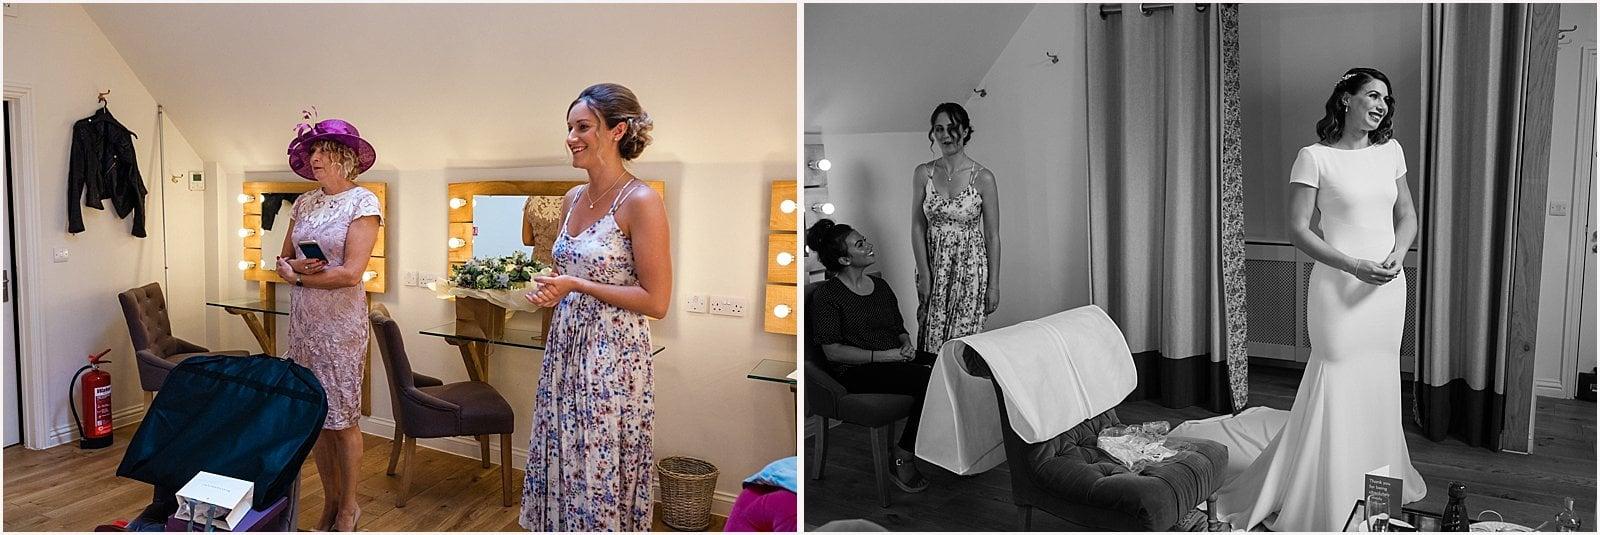 Millbridge Court Wedding - stunning summer wedding - wedding photography 21